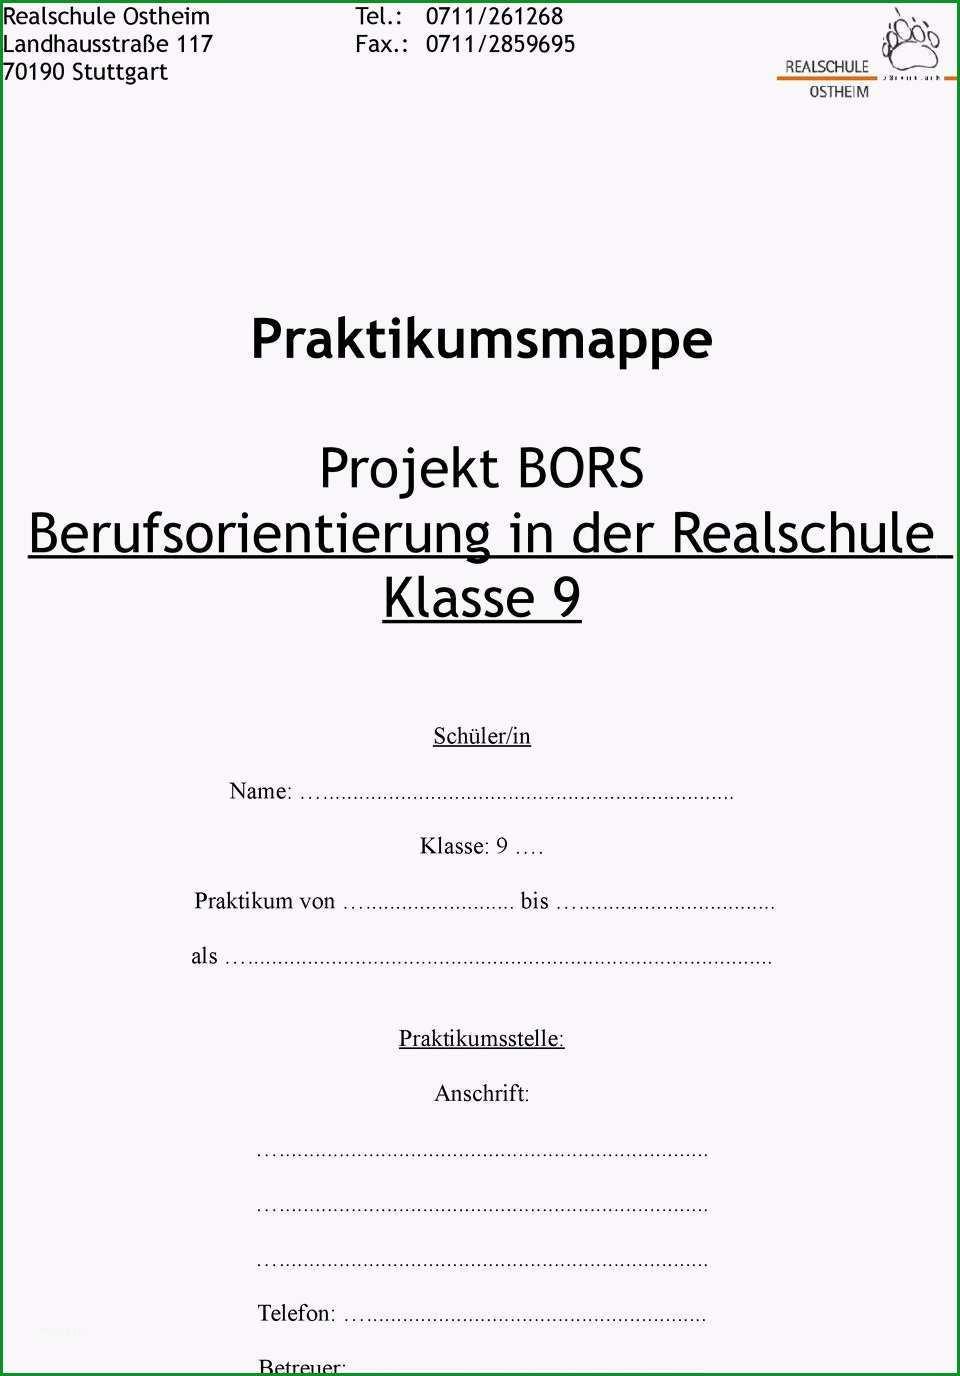 Praktikumsmappe projekt bors berufsorientierung in der realschule klasse 9